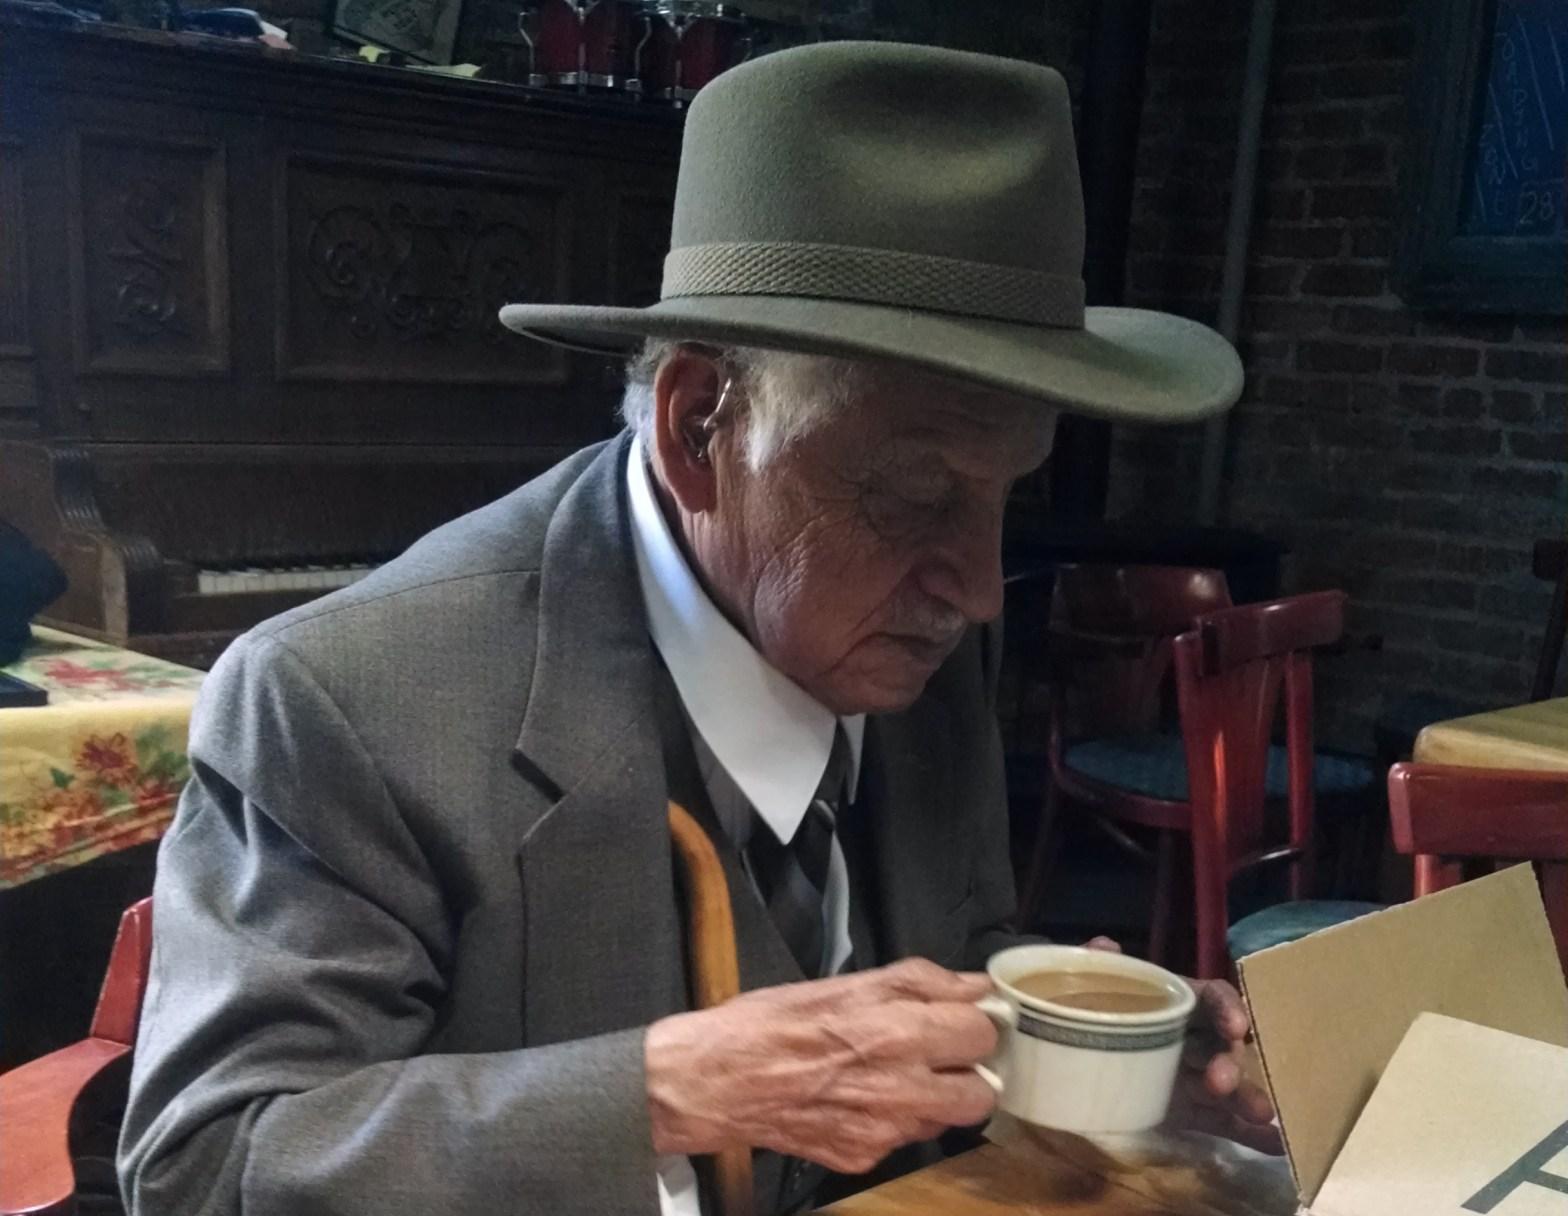 Don Tomas drinking coffee